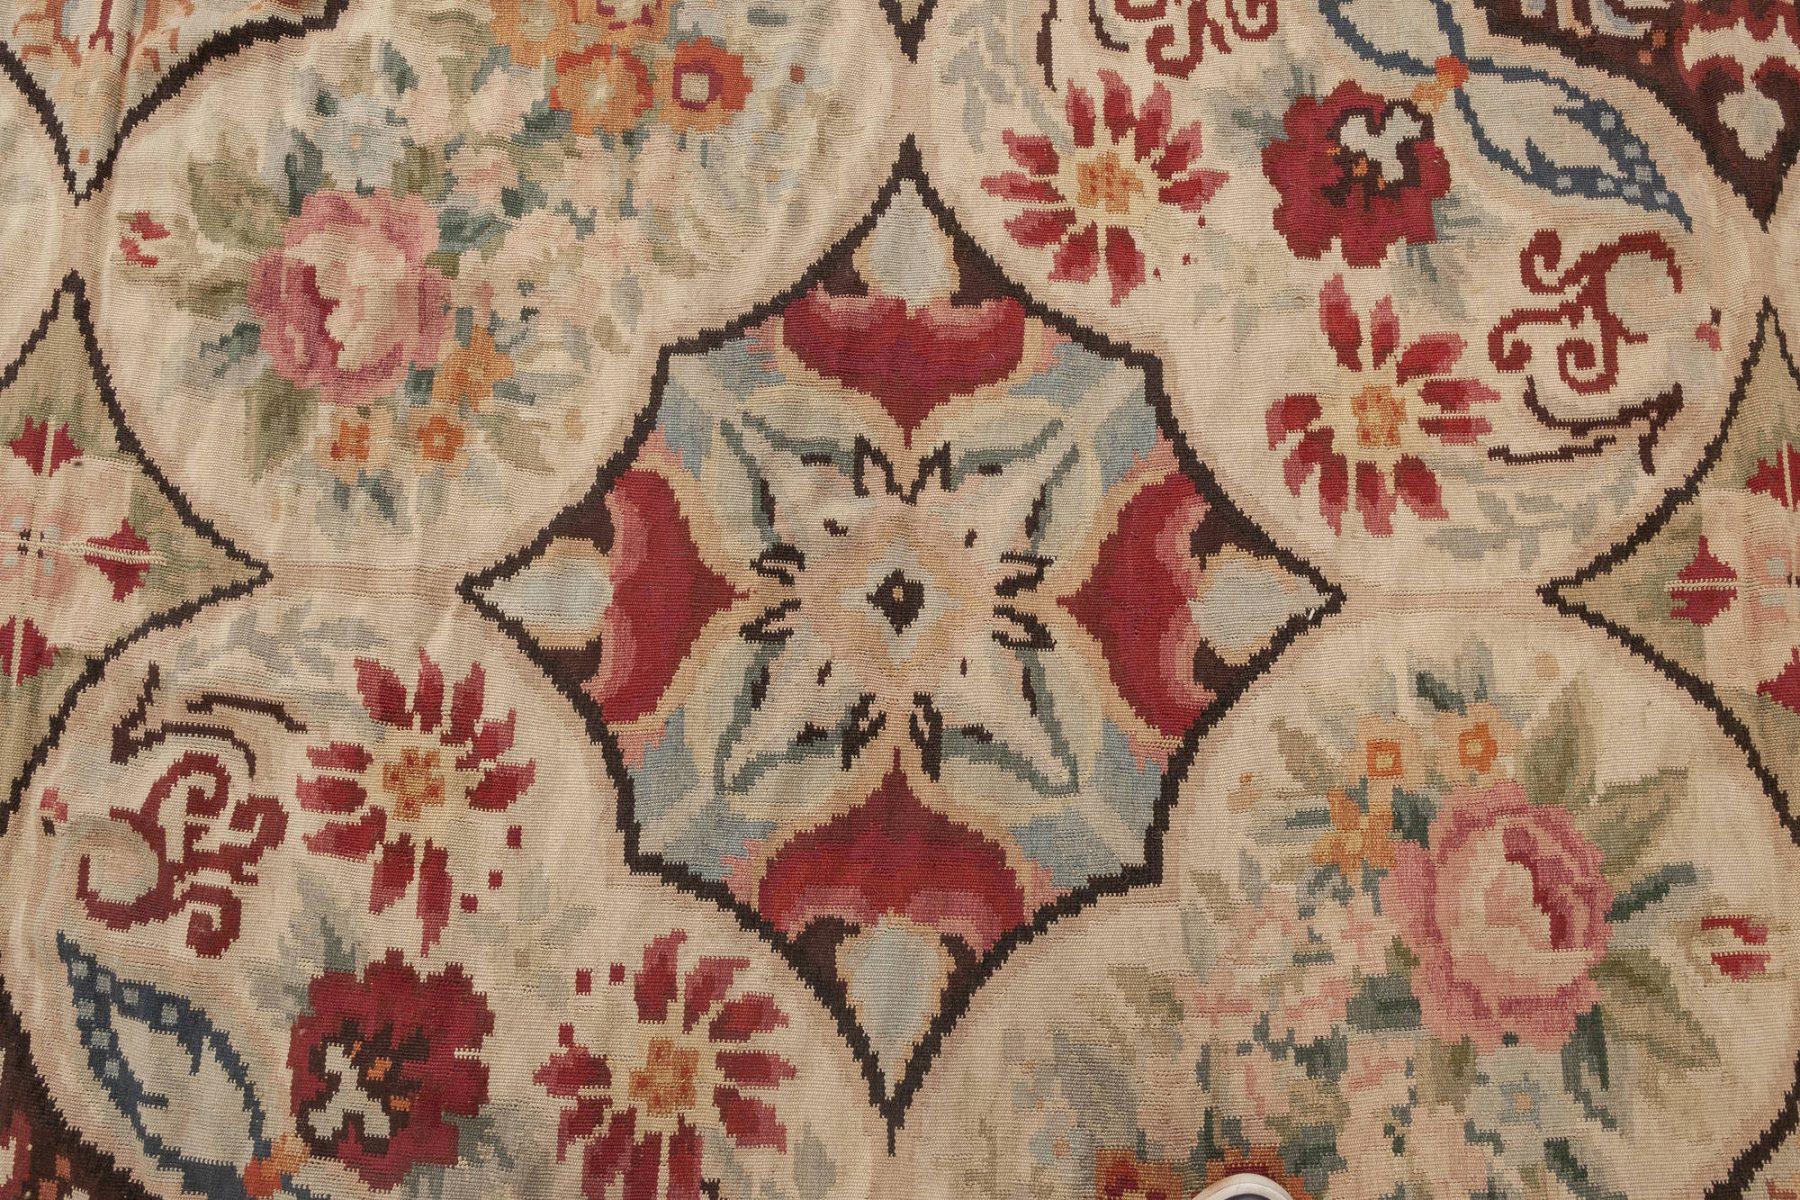 Bessarabian Design Blue, Brown, Green, Pink and Red Wool Rug N11902